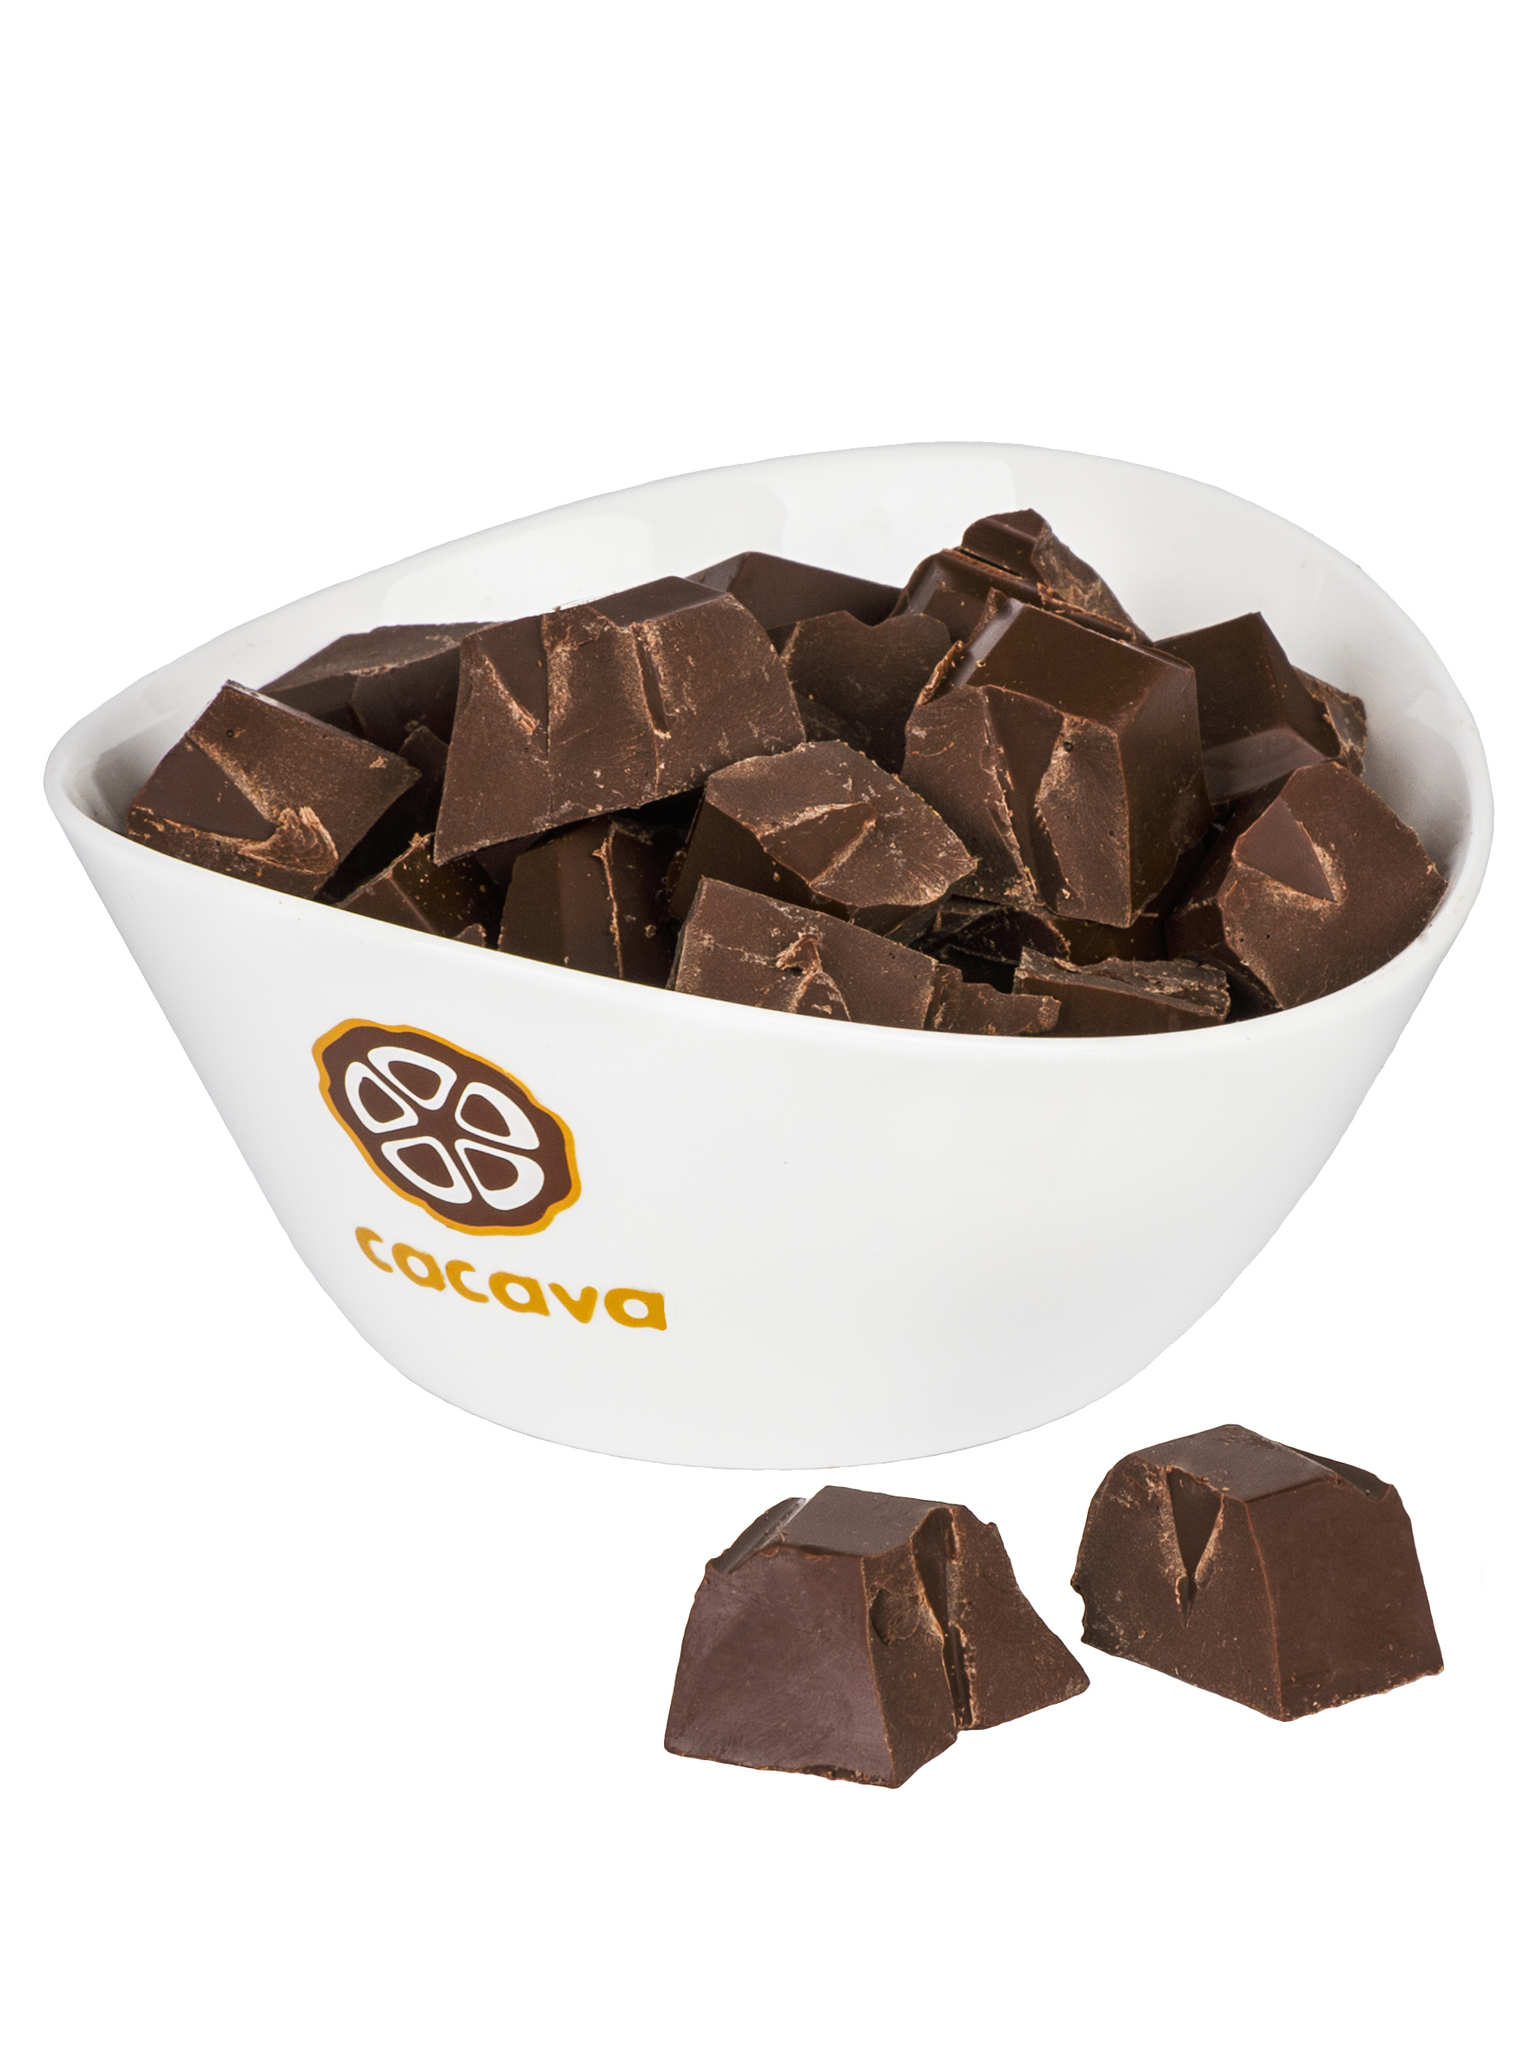 Молочный шоколад 50 % какао (Доминикана), внешний вид